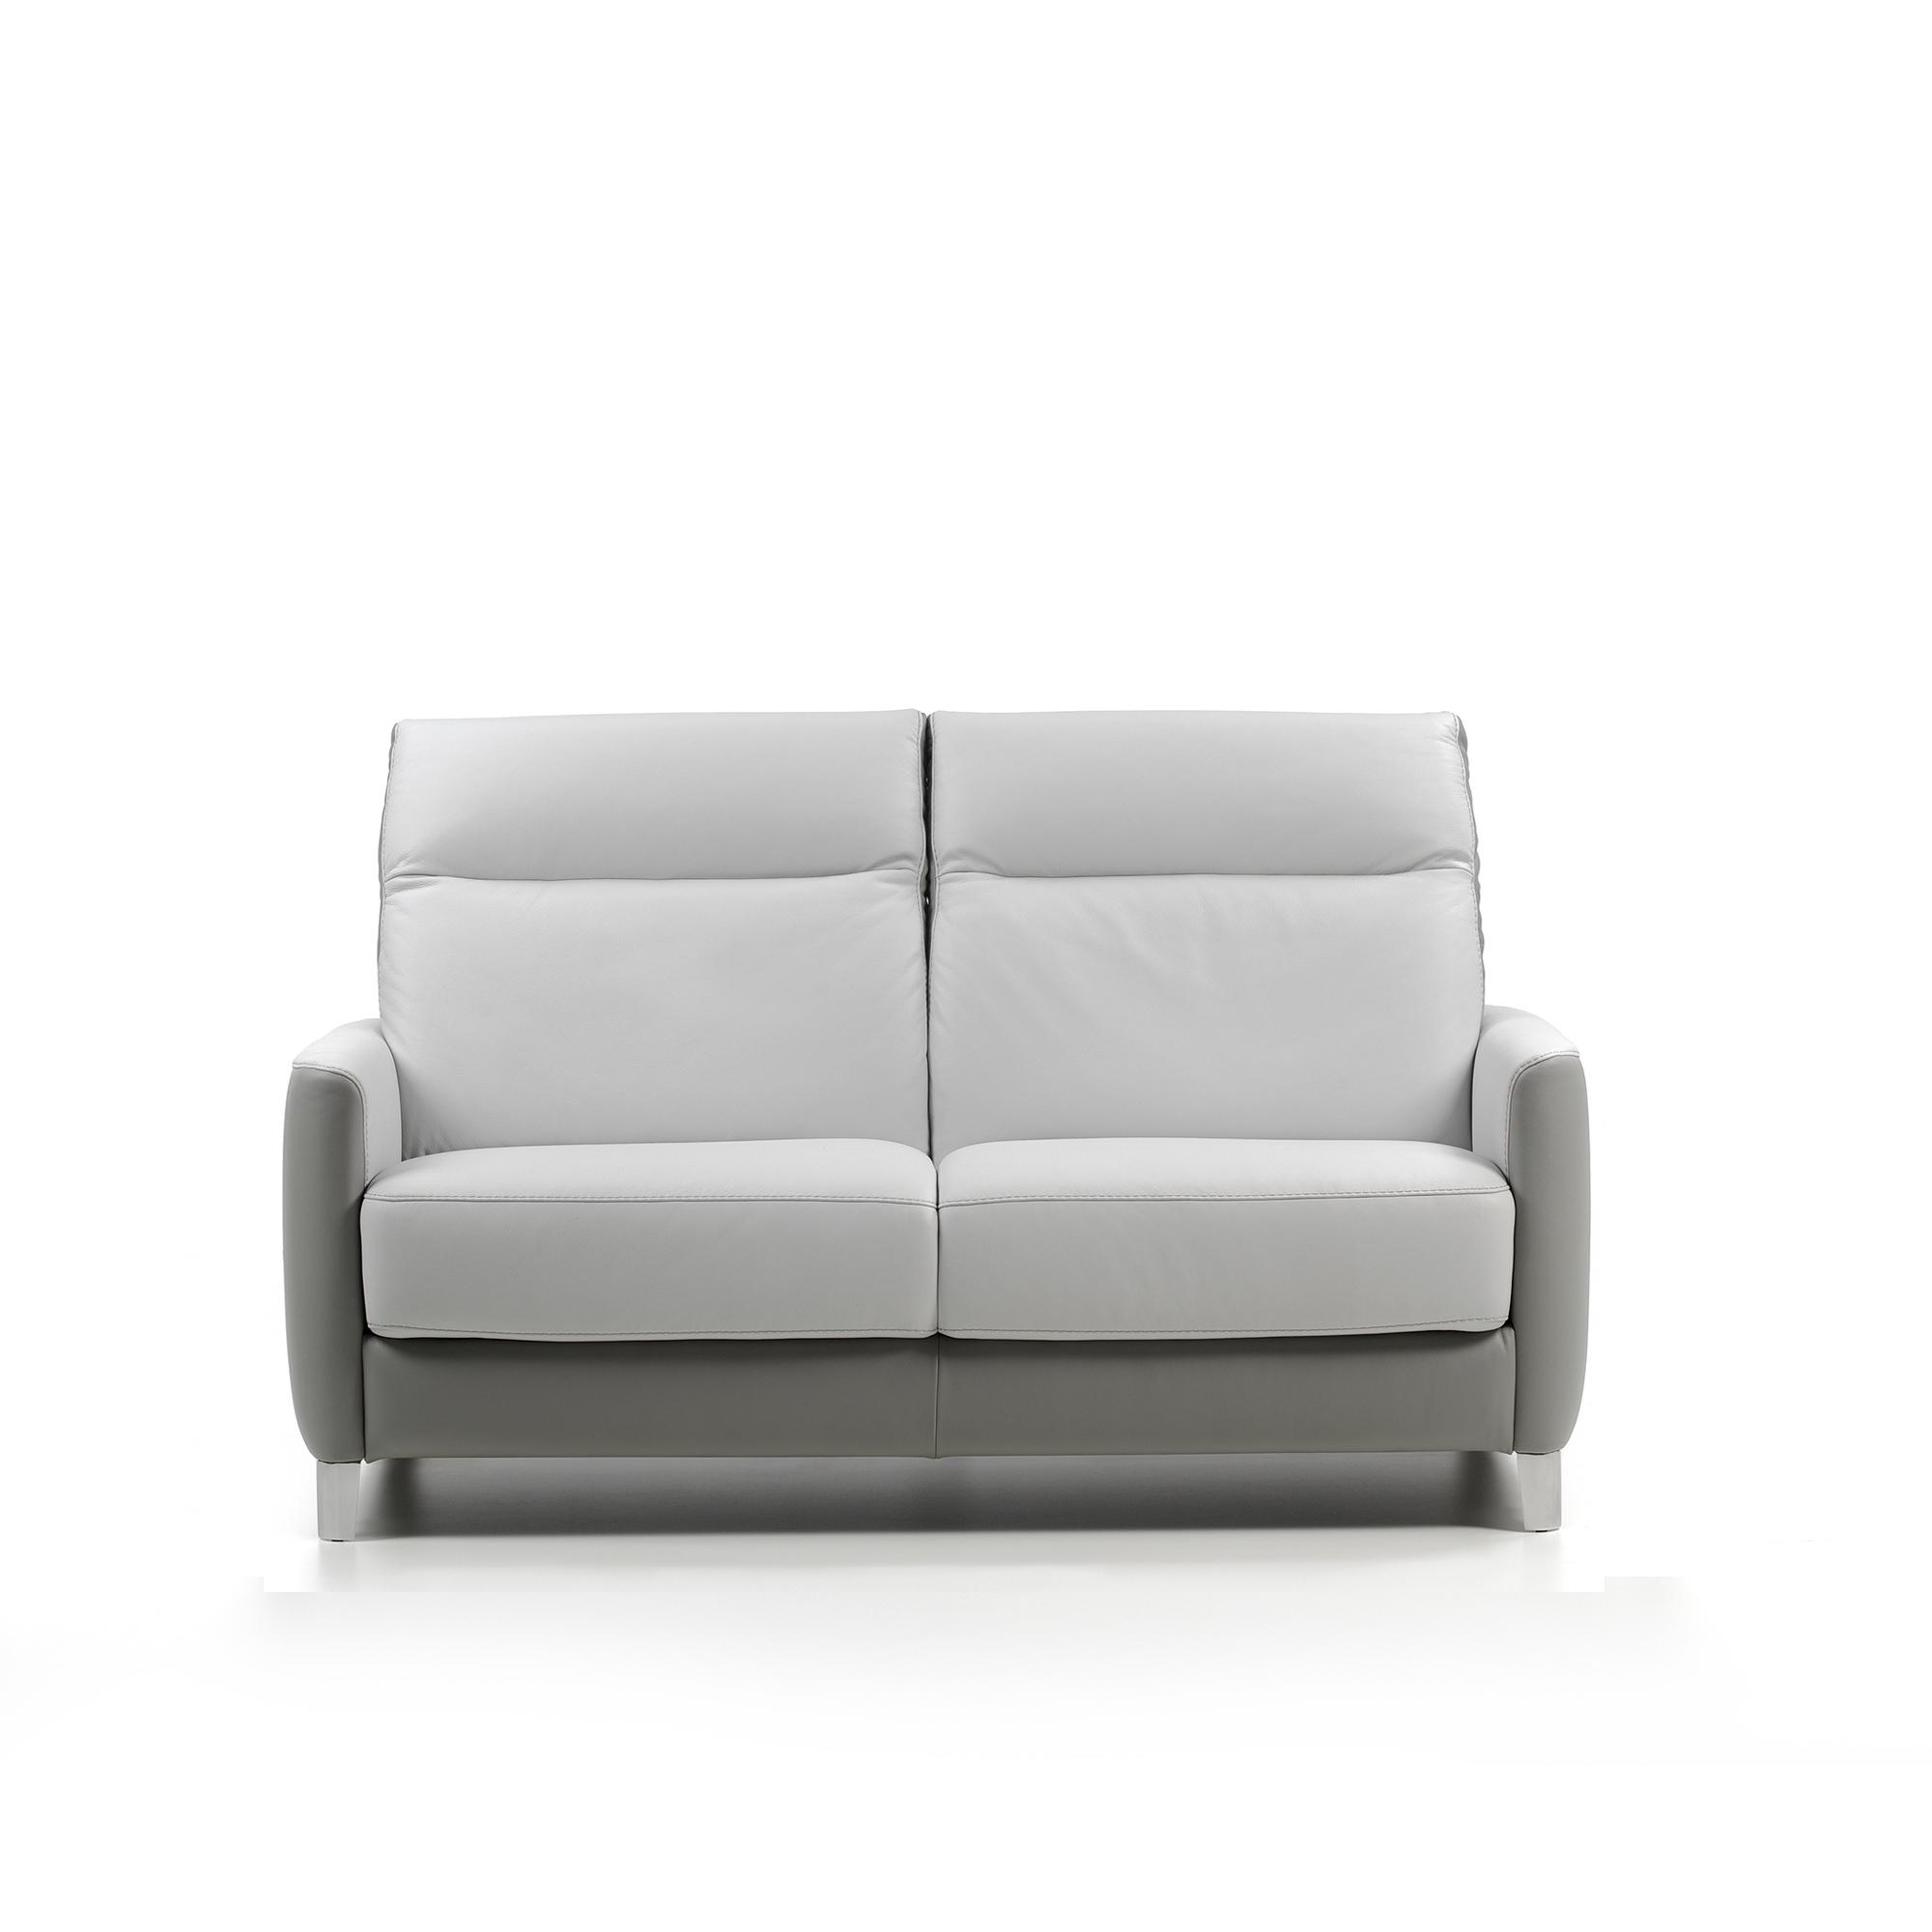 Rom Pacific Medium Sofa All Sofas